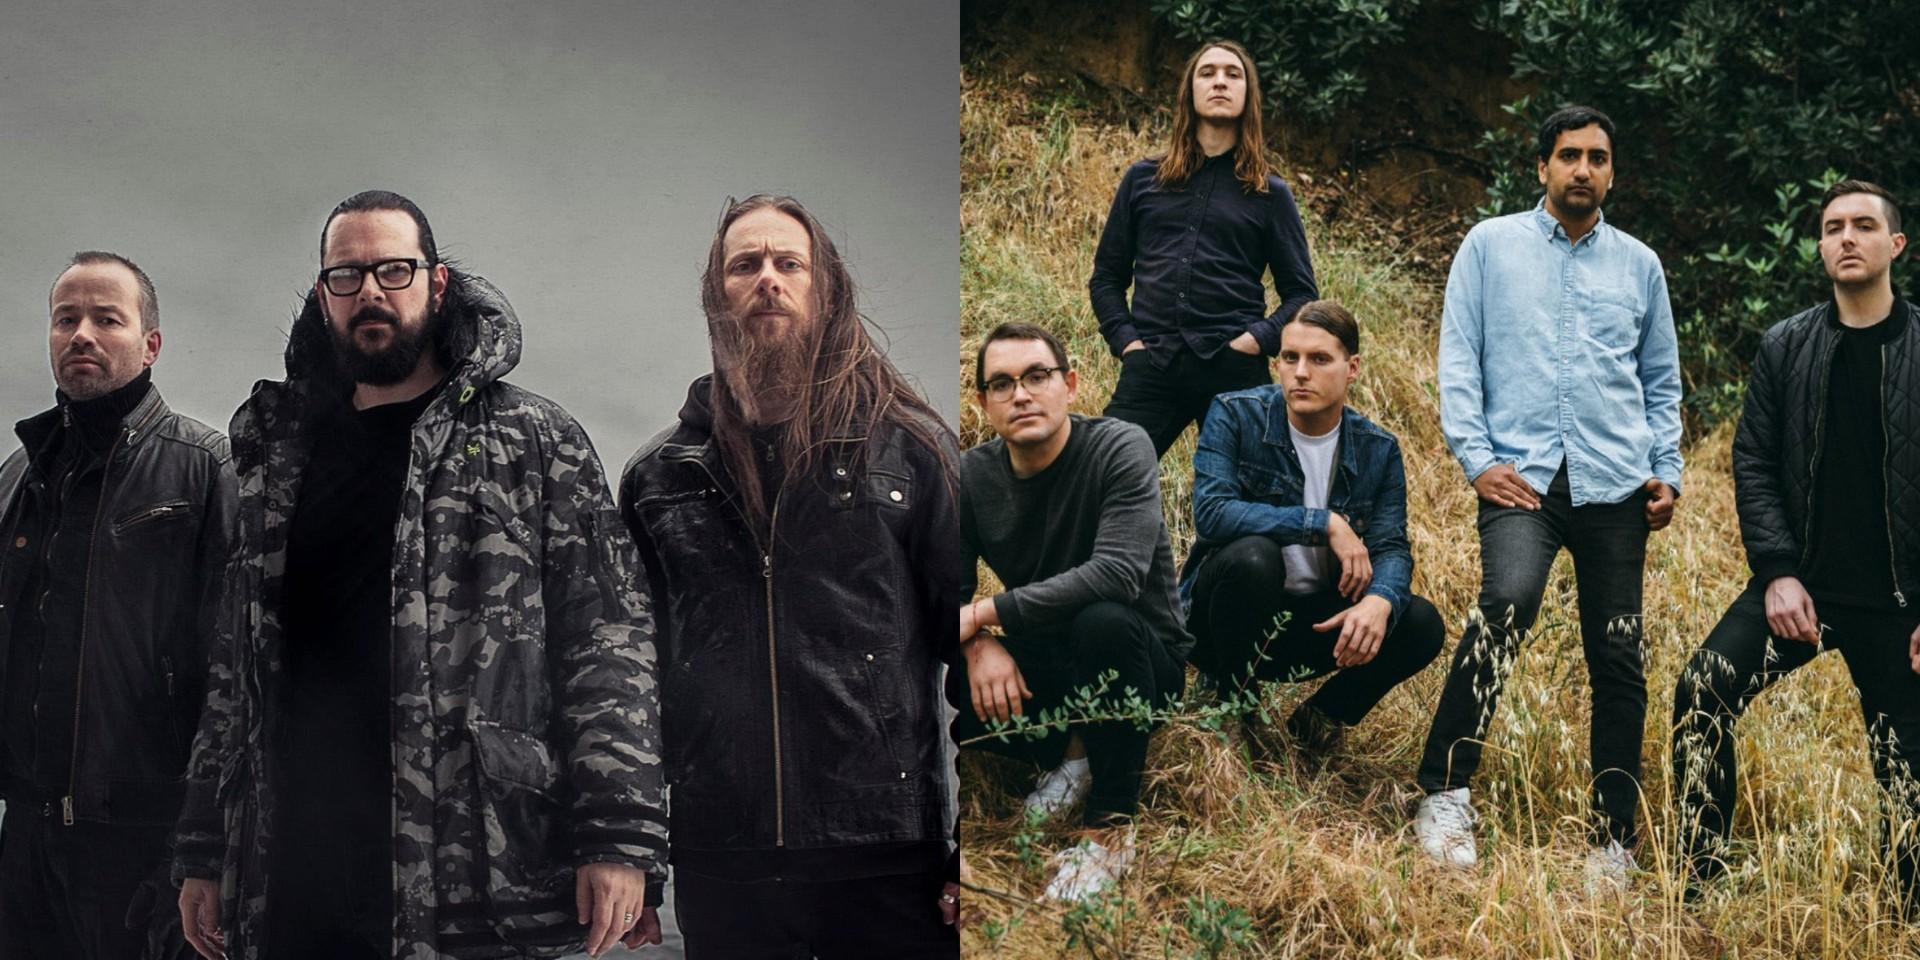 Emperor and Deafheaven announce Japan tour